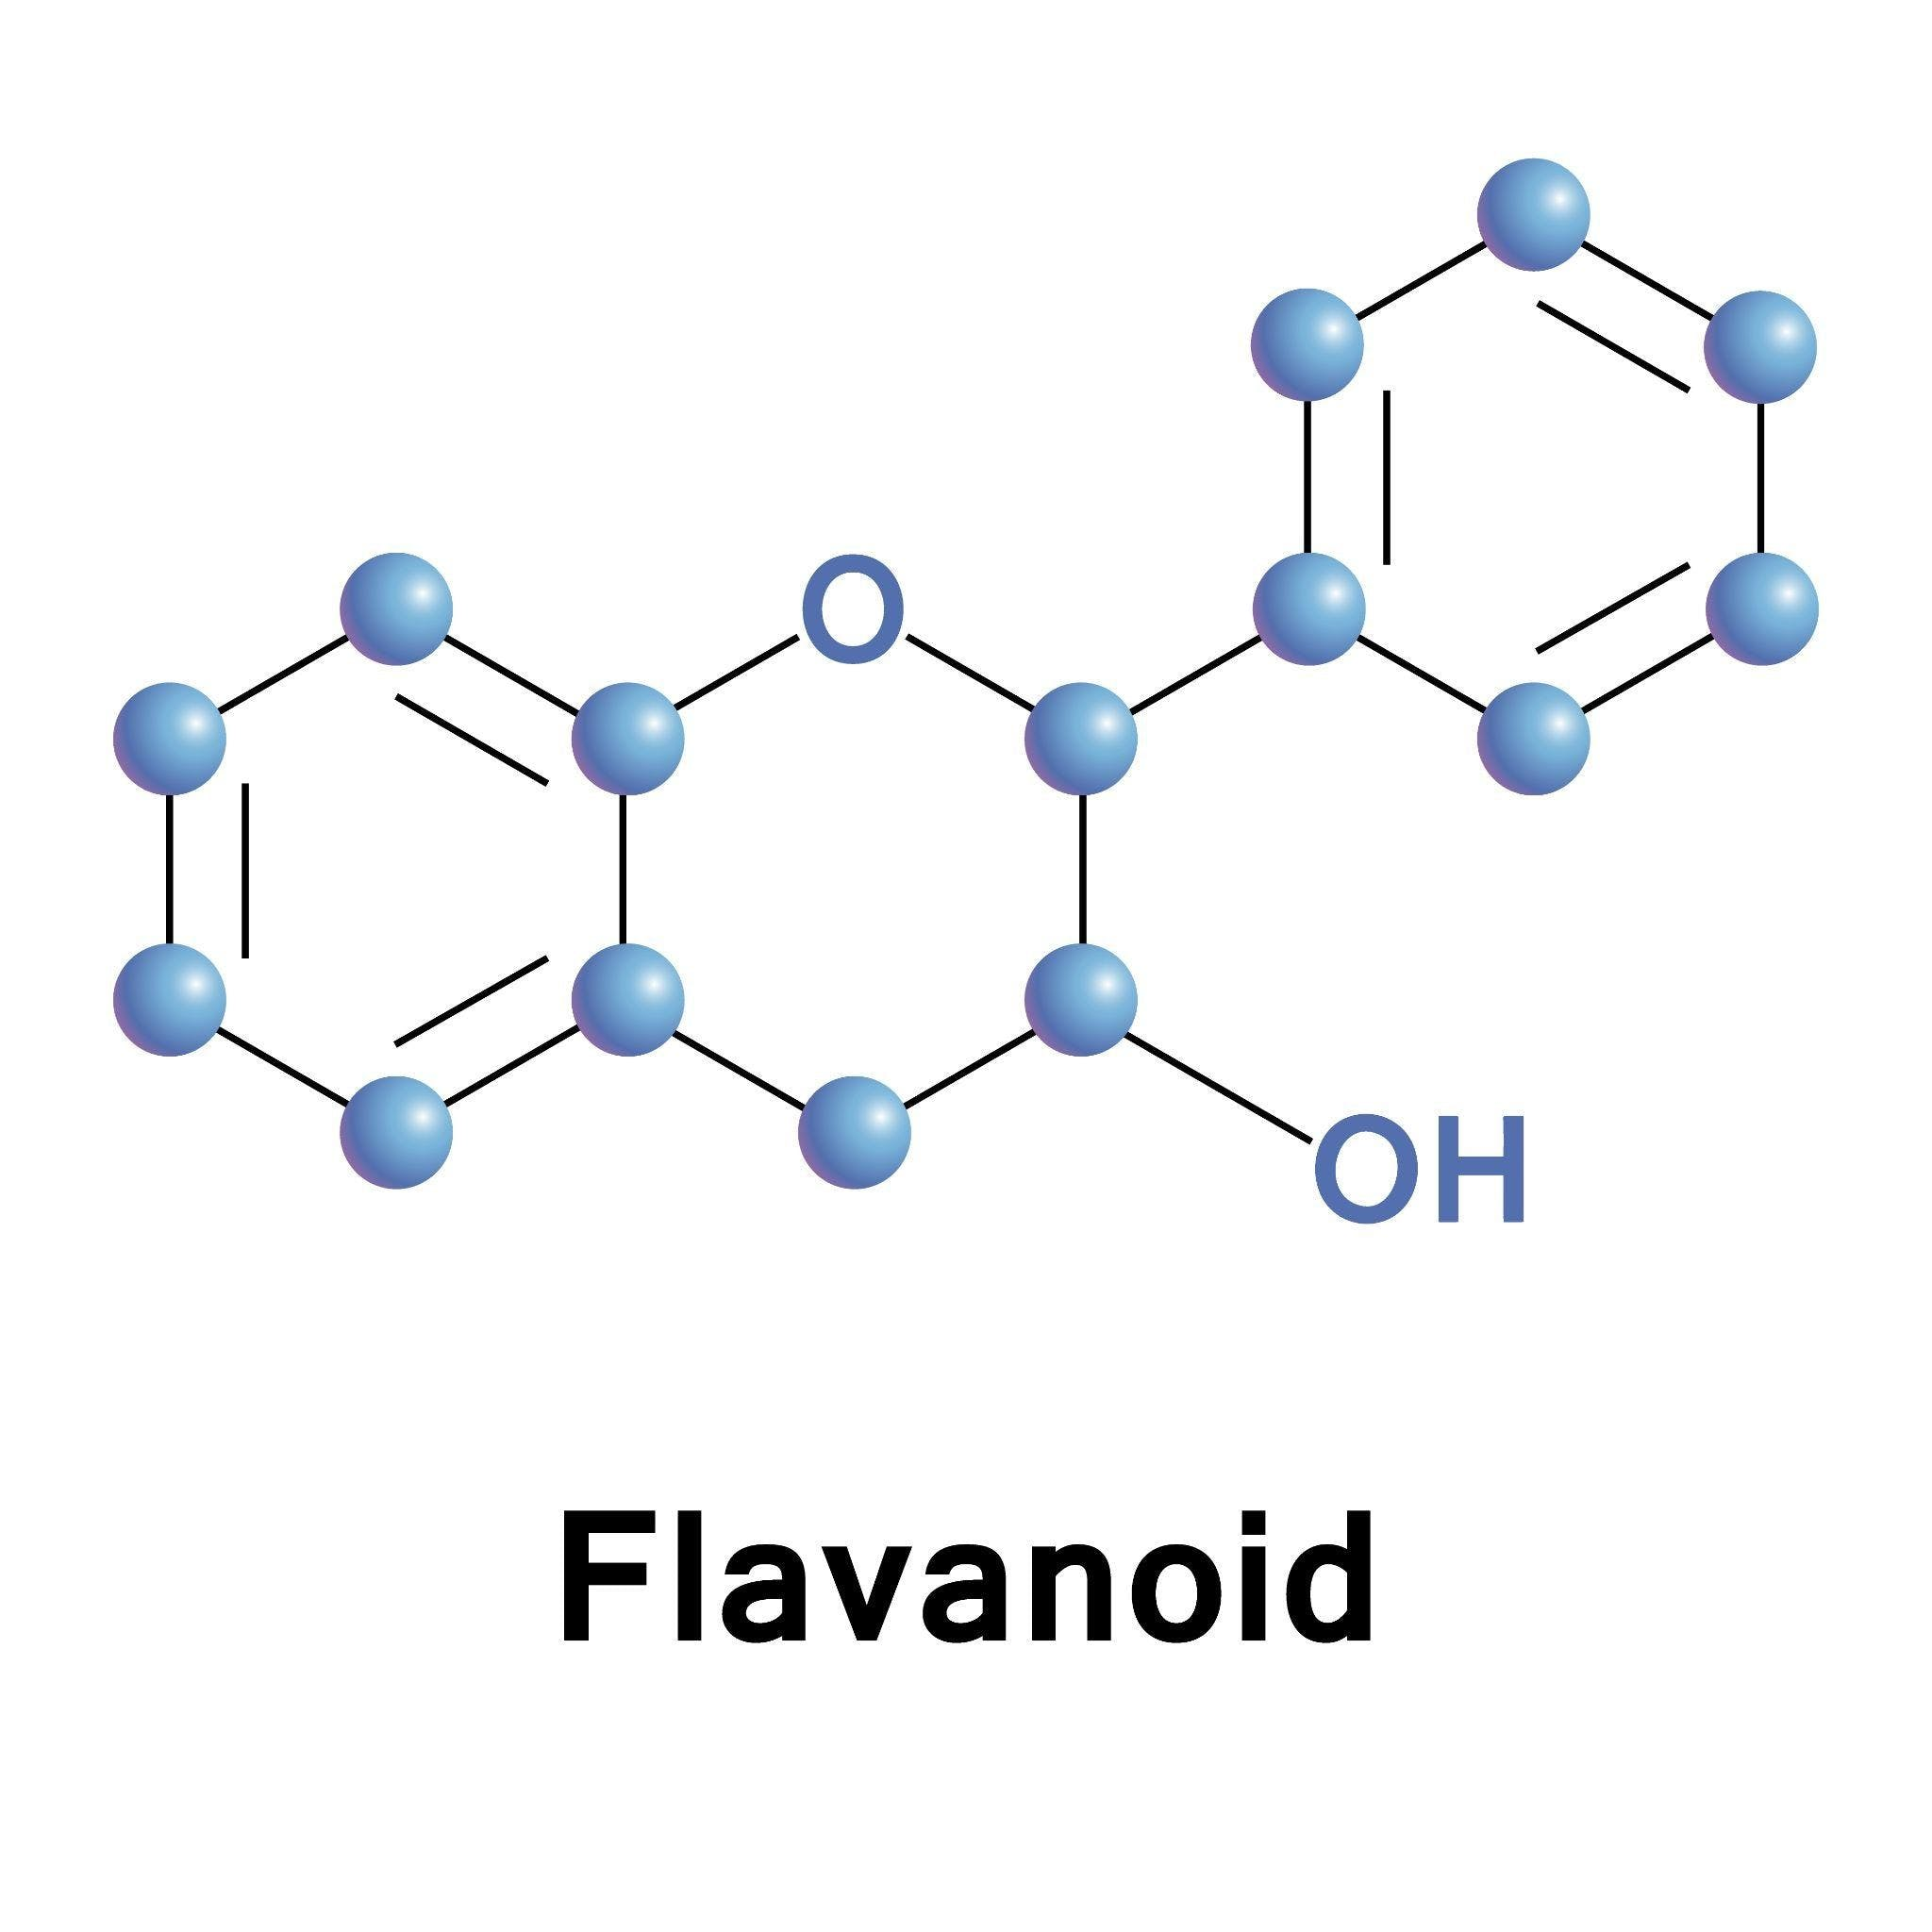 Bioflavonoids